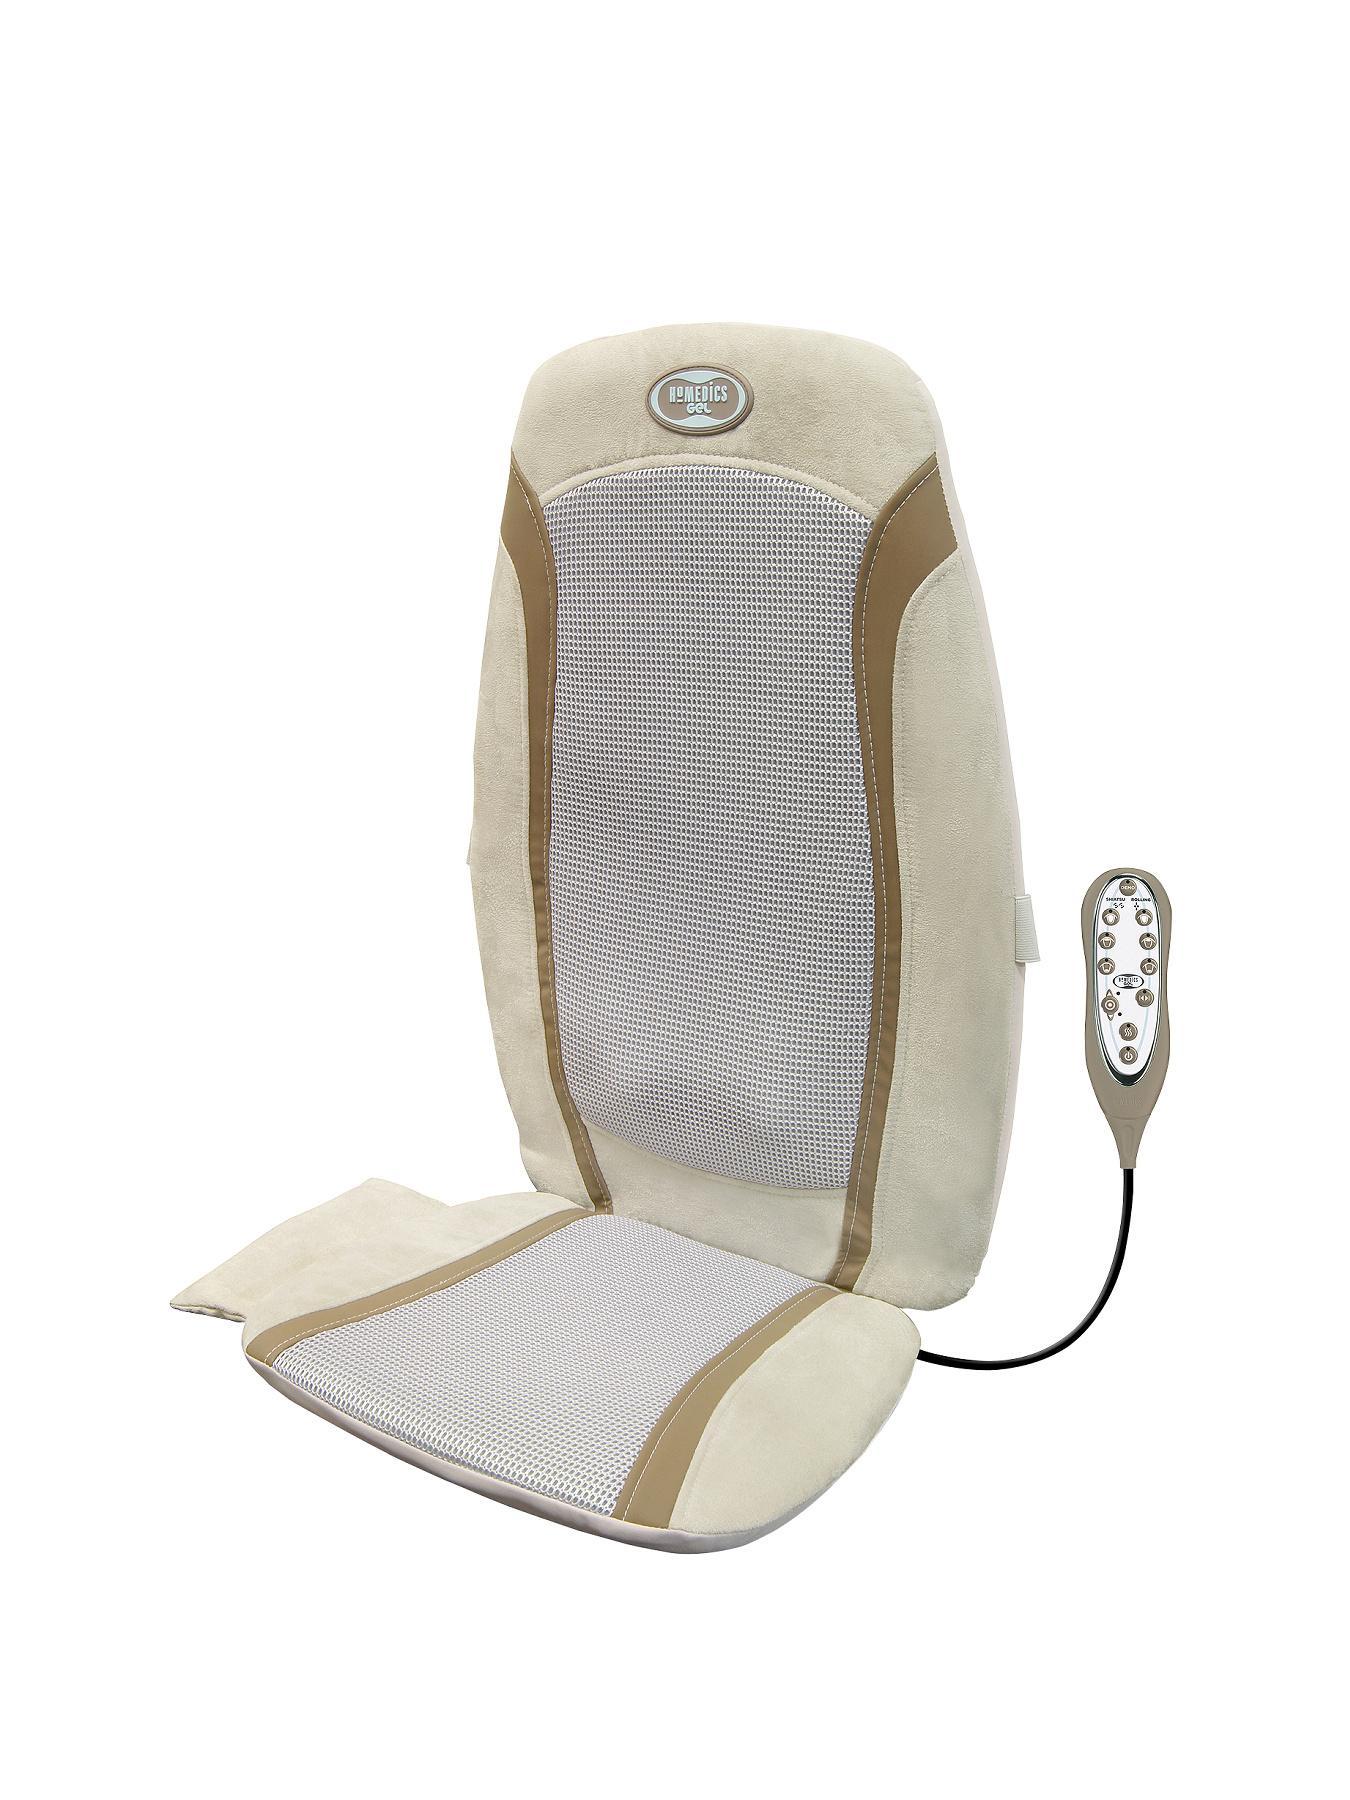 Homedics Gel Shiatsu Massage Cushion - Grey